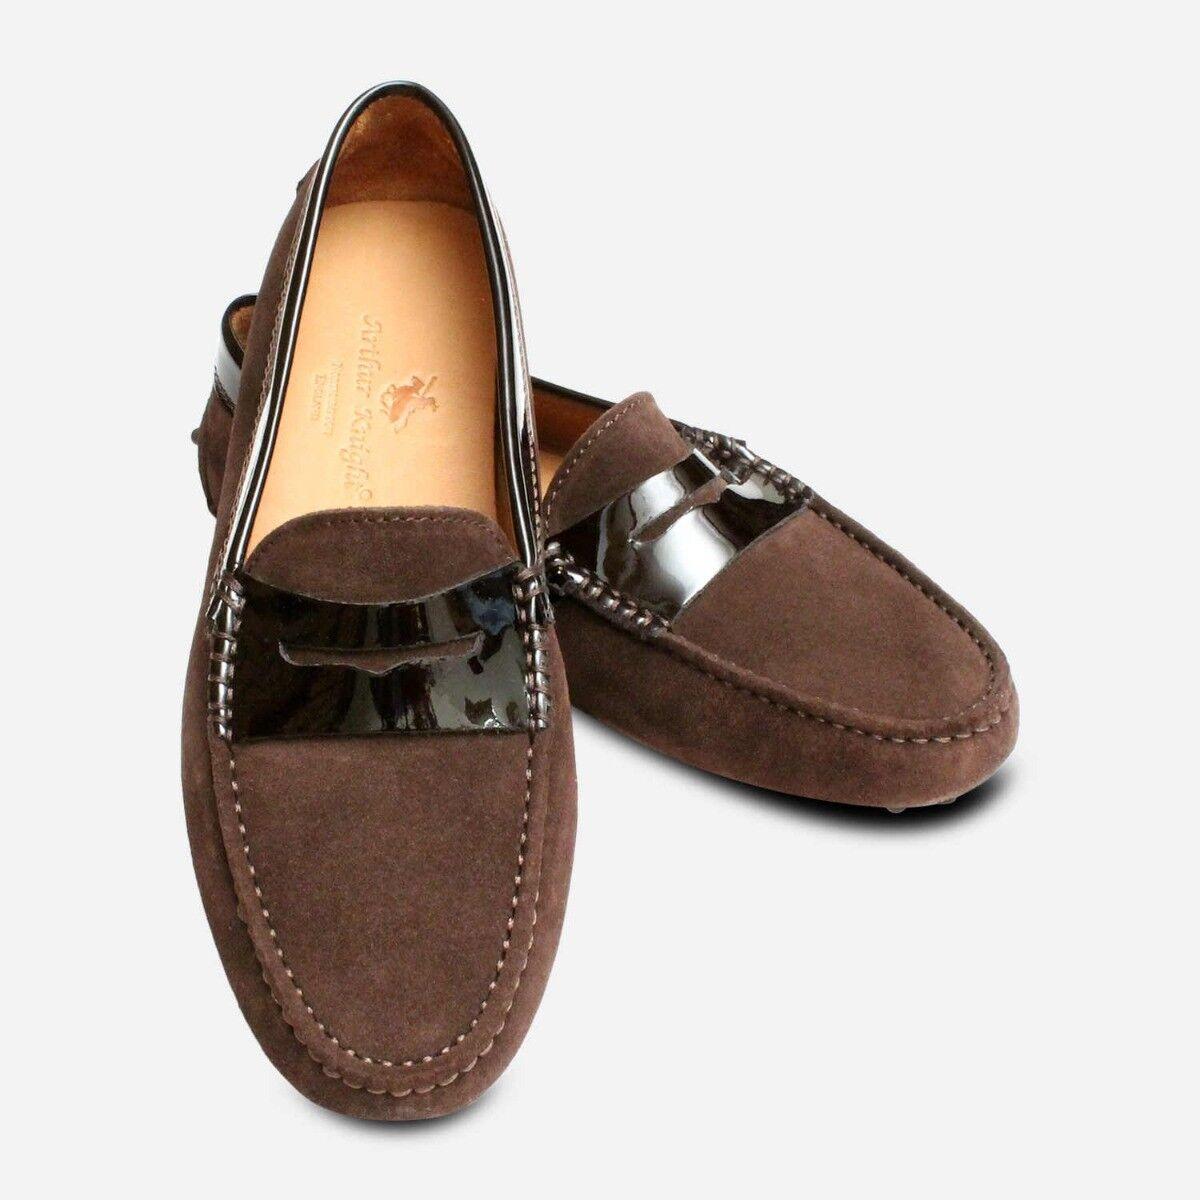 Dark Brown Suede Ladies Driving shoes Moccasin